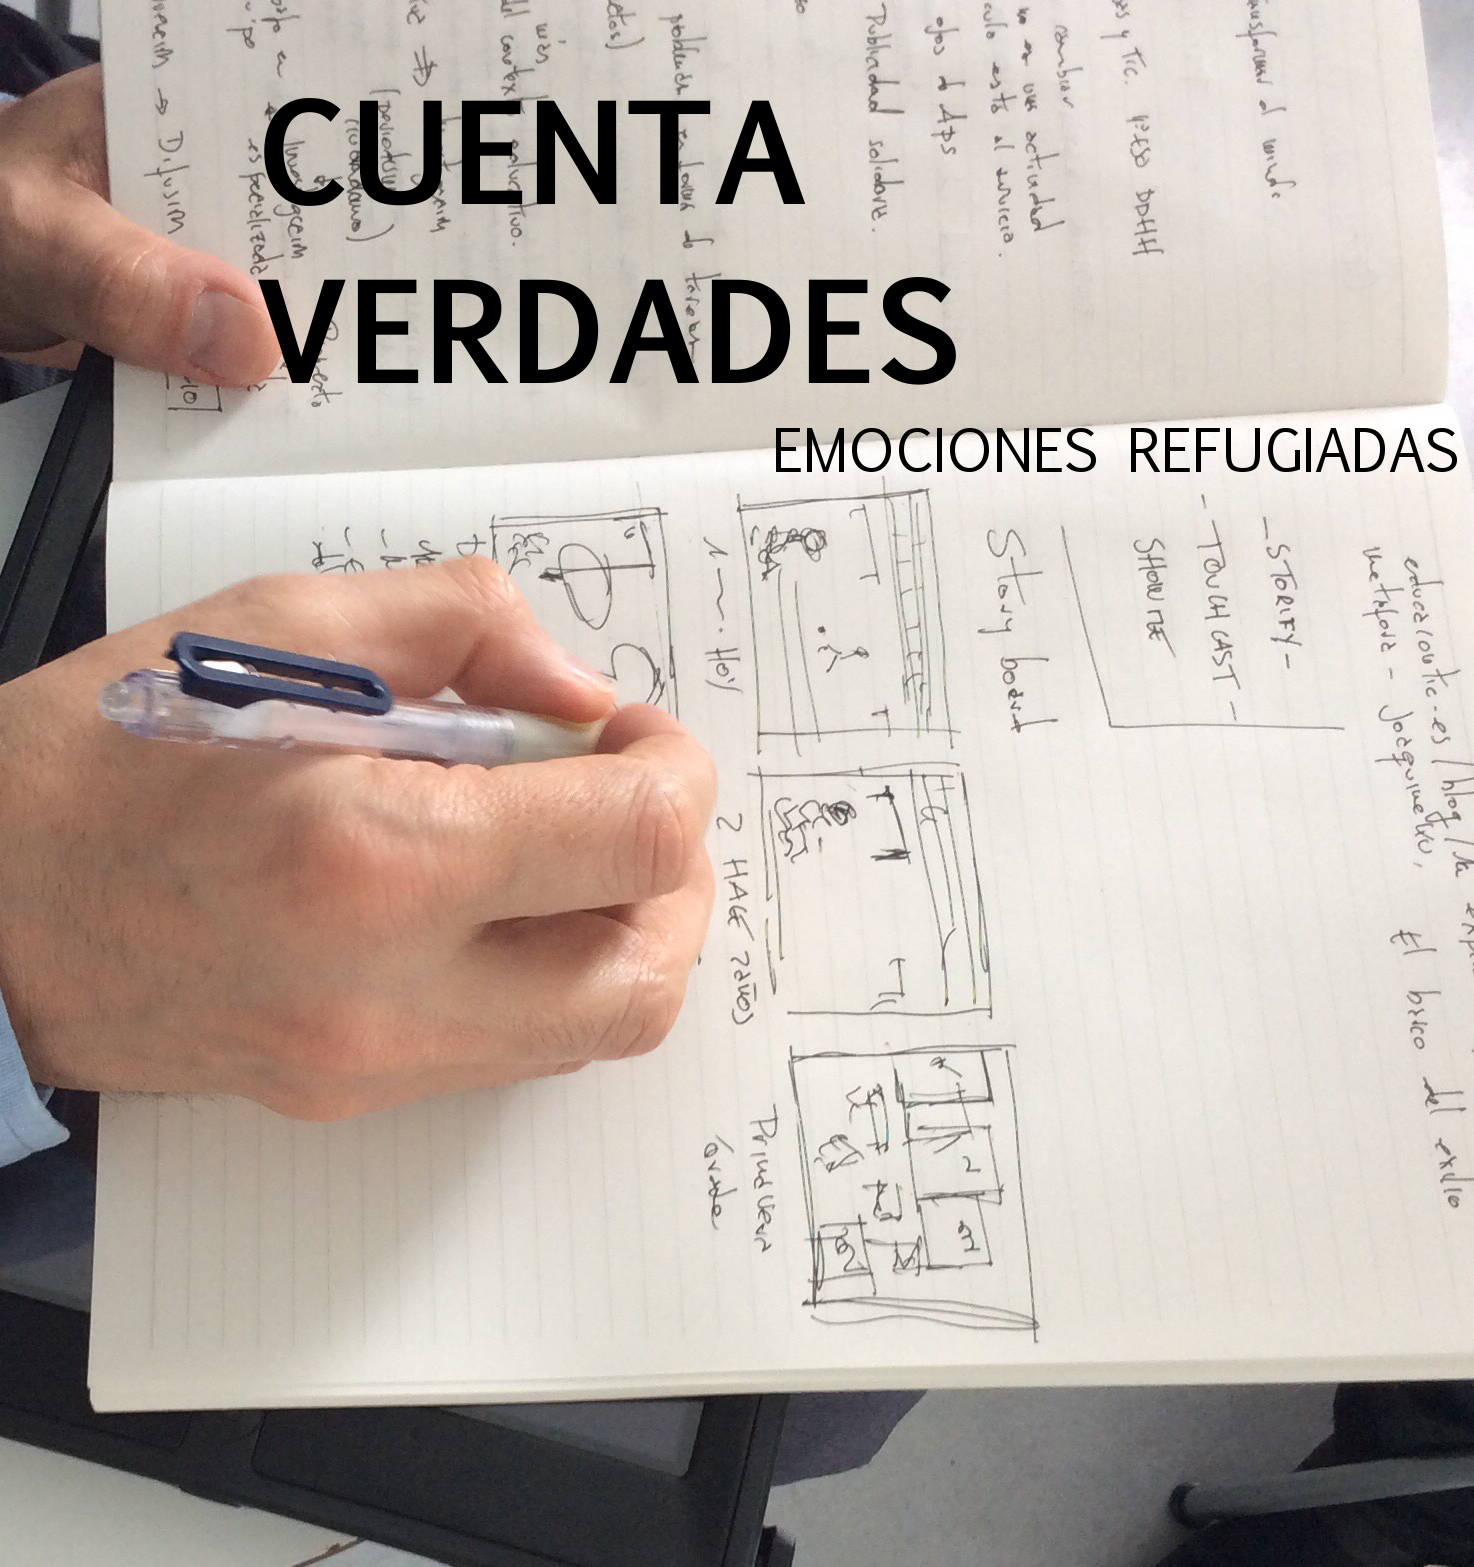 Storyboard Cuentaverdades.png